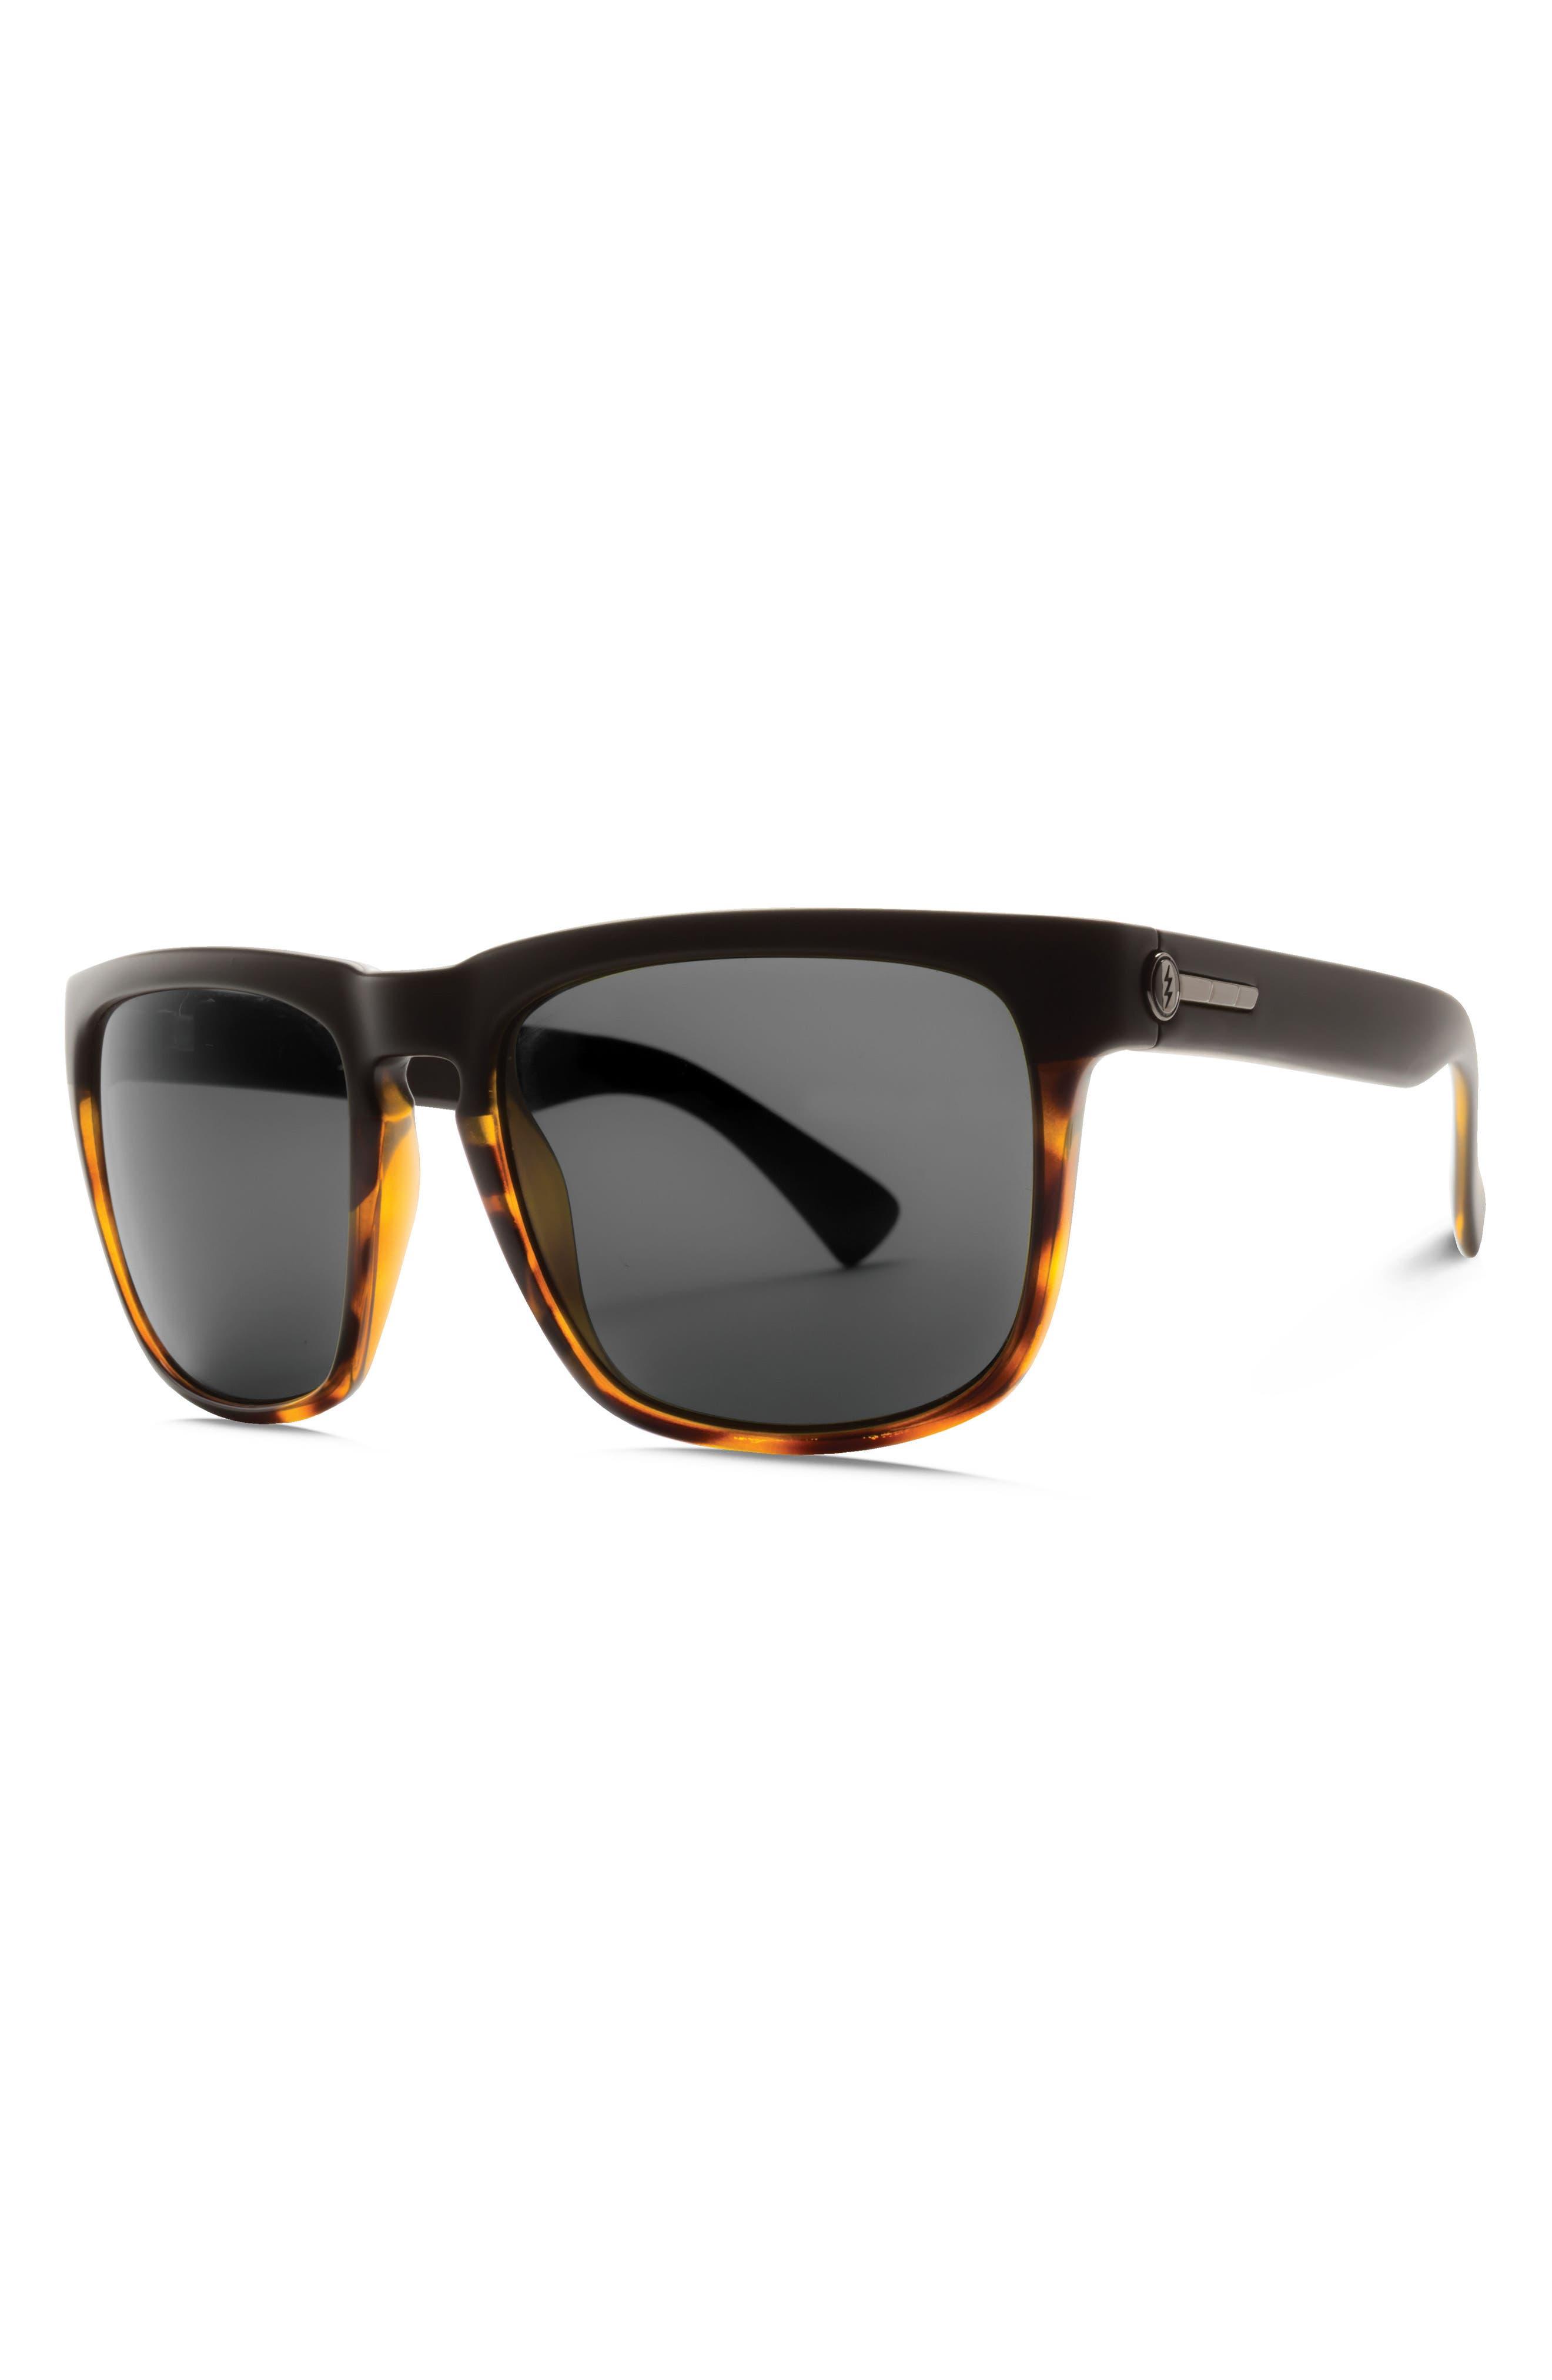 Knoxville XL 61mm Sunglasses,                             Alternate thumbnail 2, color,                             Darkside Tortoise/ Grey